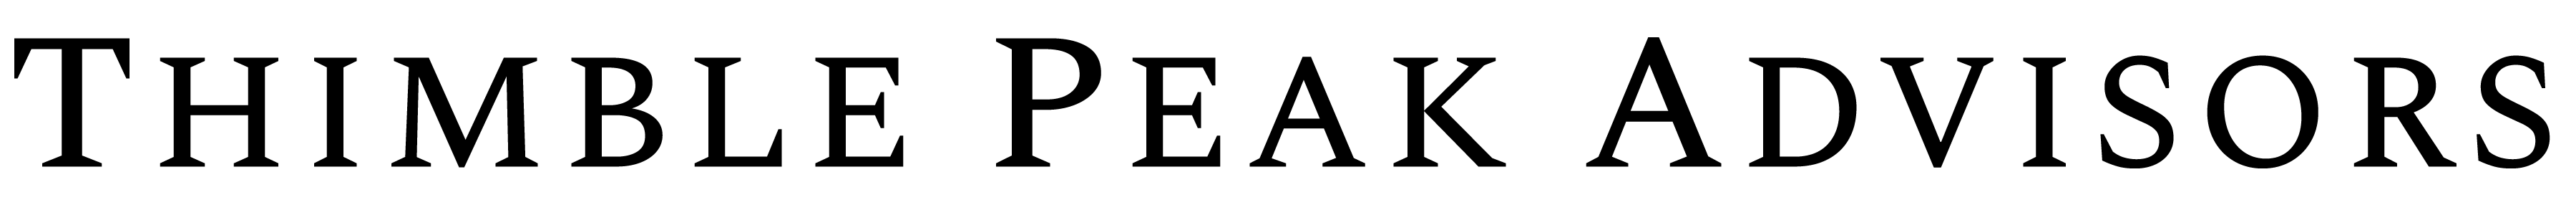 Thimble-Peak-Advisors-logo